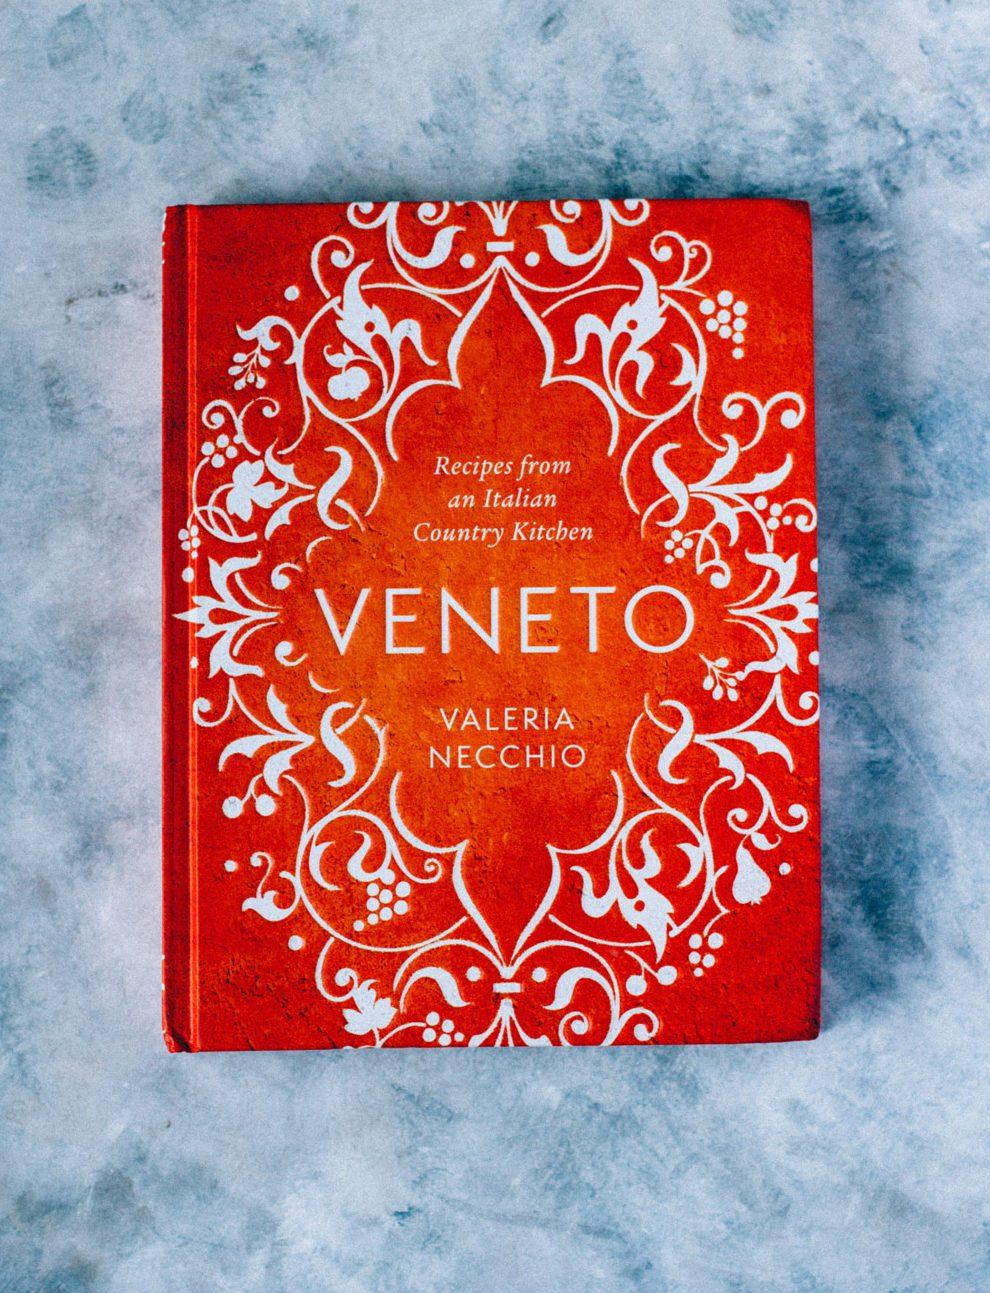 veneto-1-1-e1499779419253.jpg